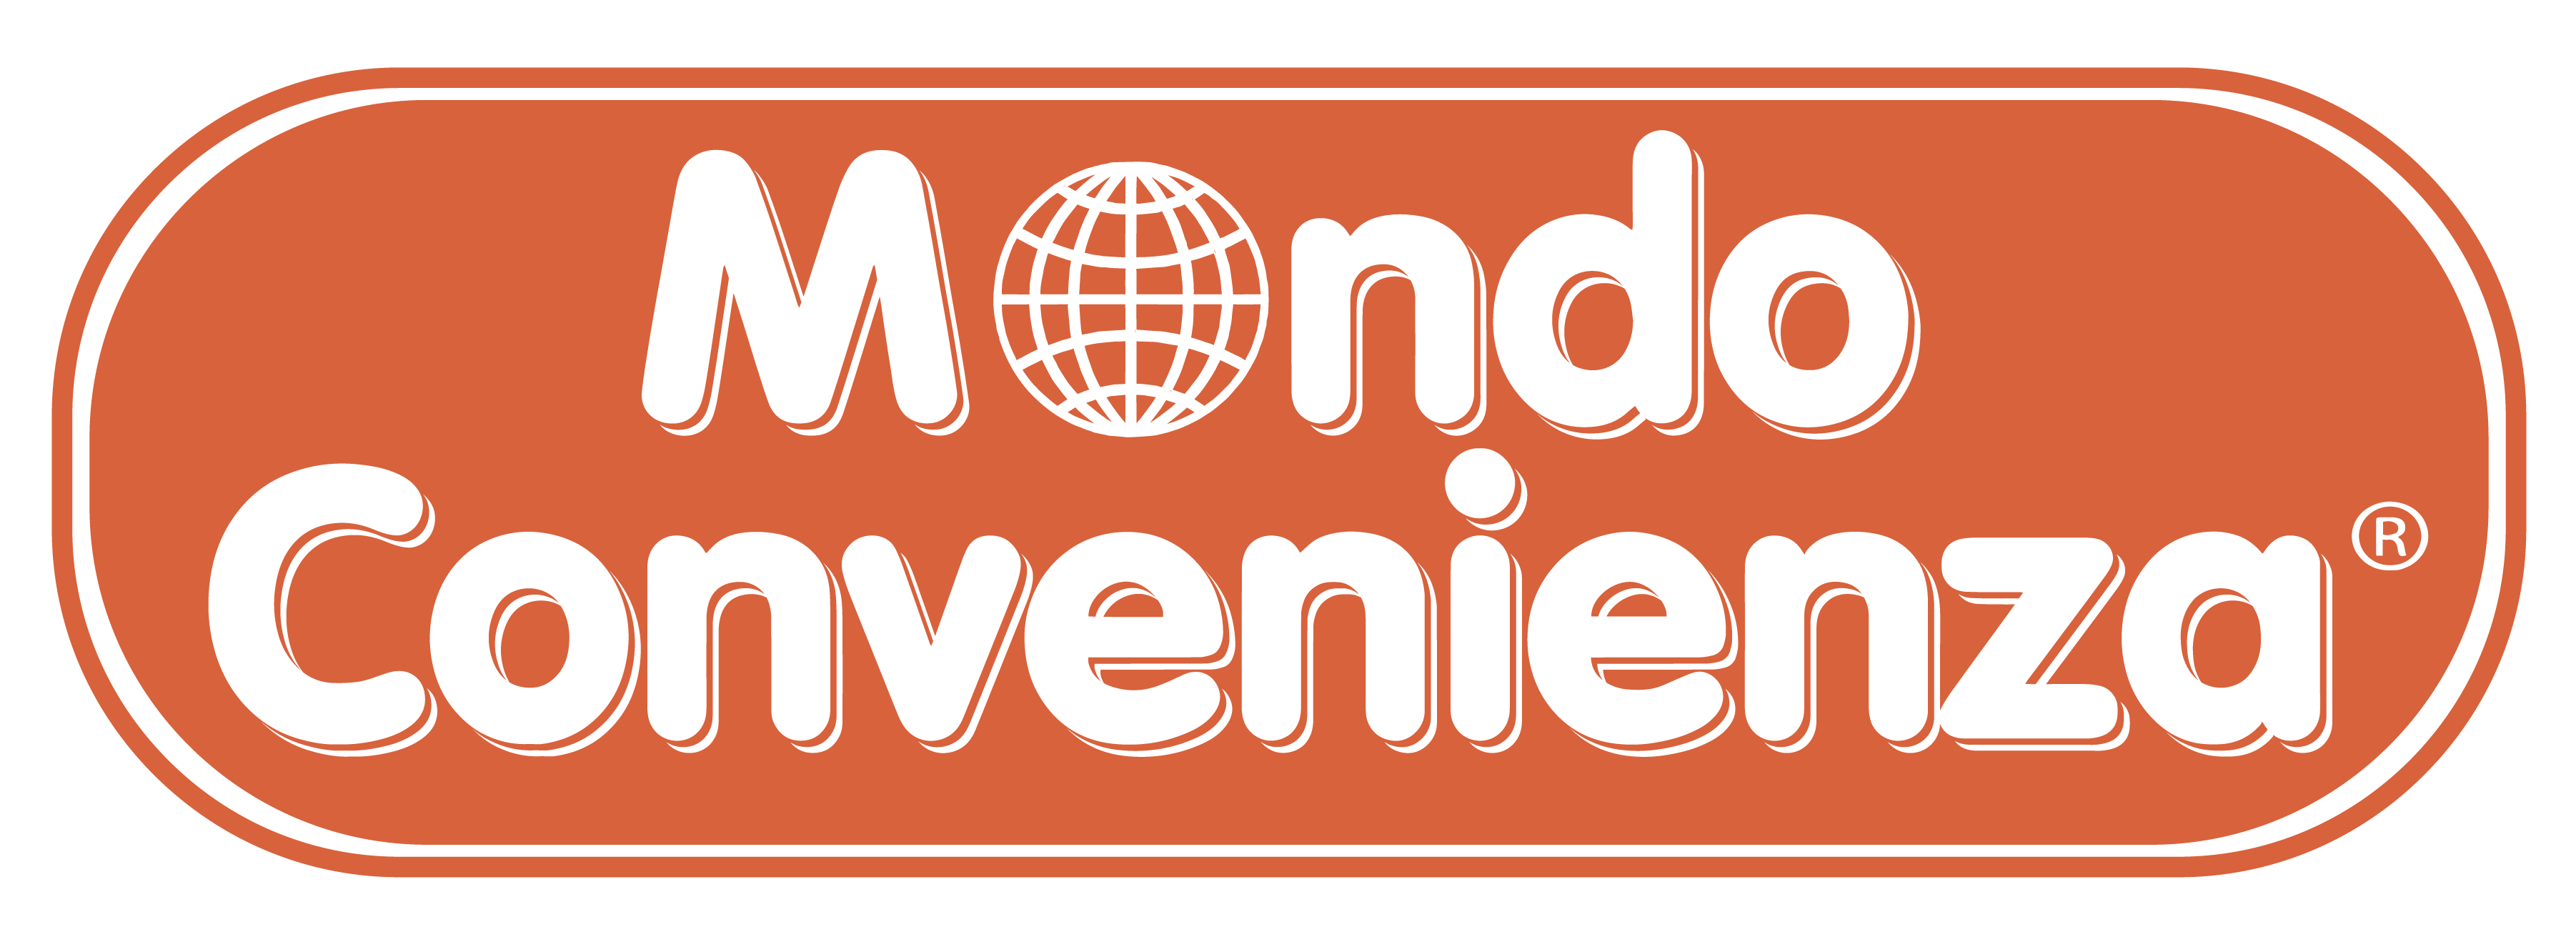 Customer Microlog Retail Mondo Convenienza